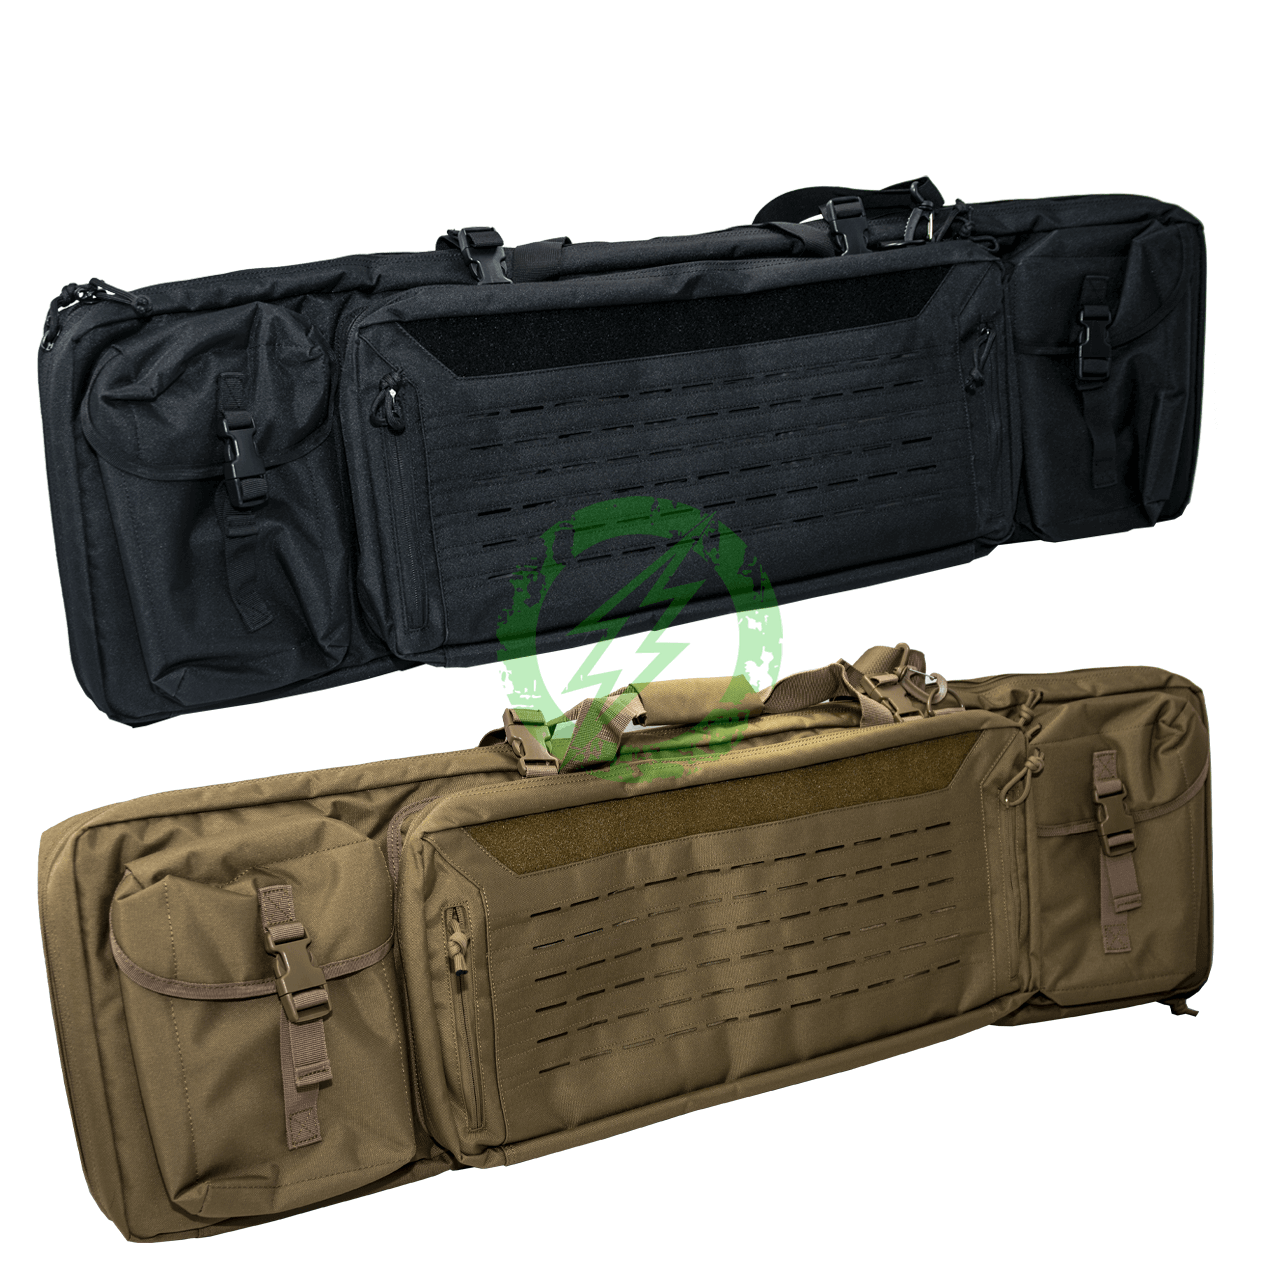 "Guawin Laser Cut 42"" Rifle Bag   Black & Tan"